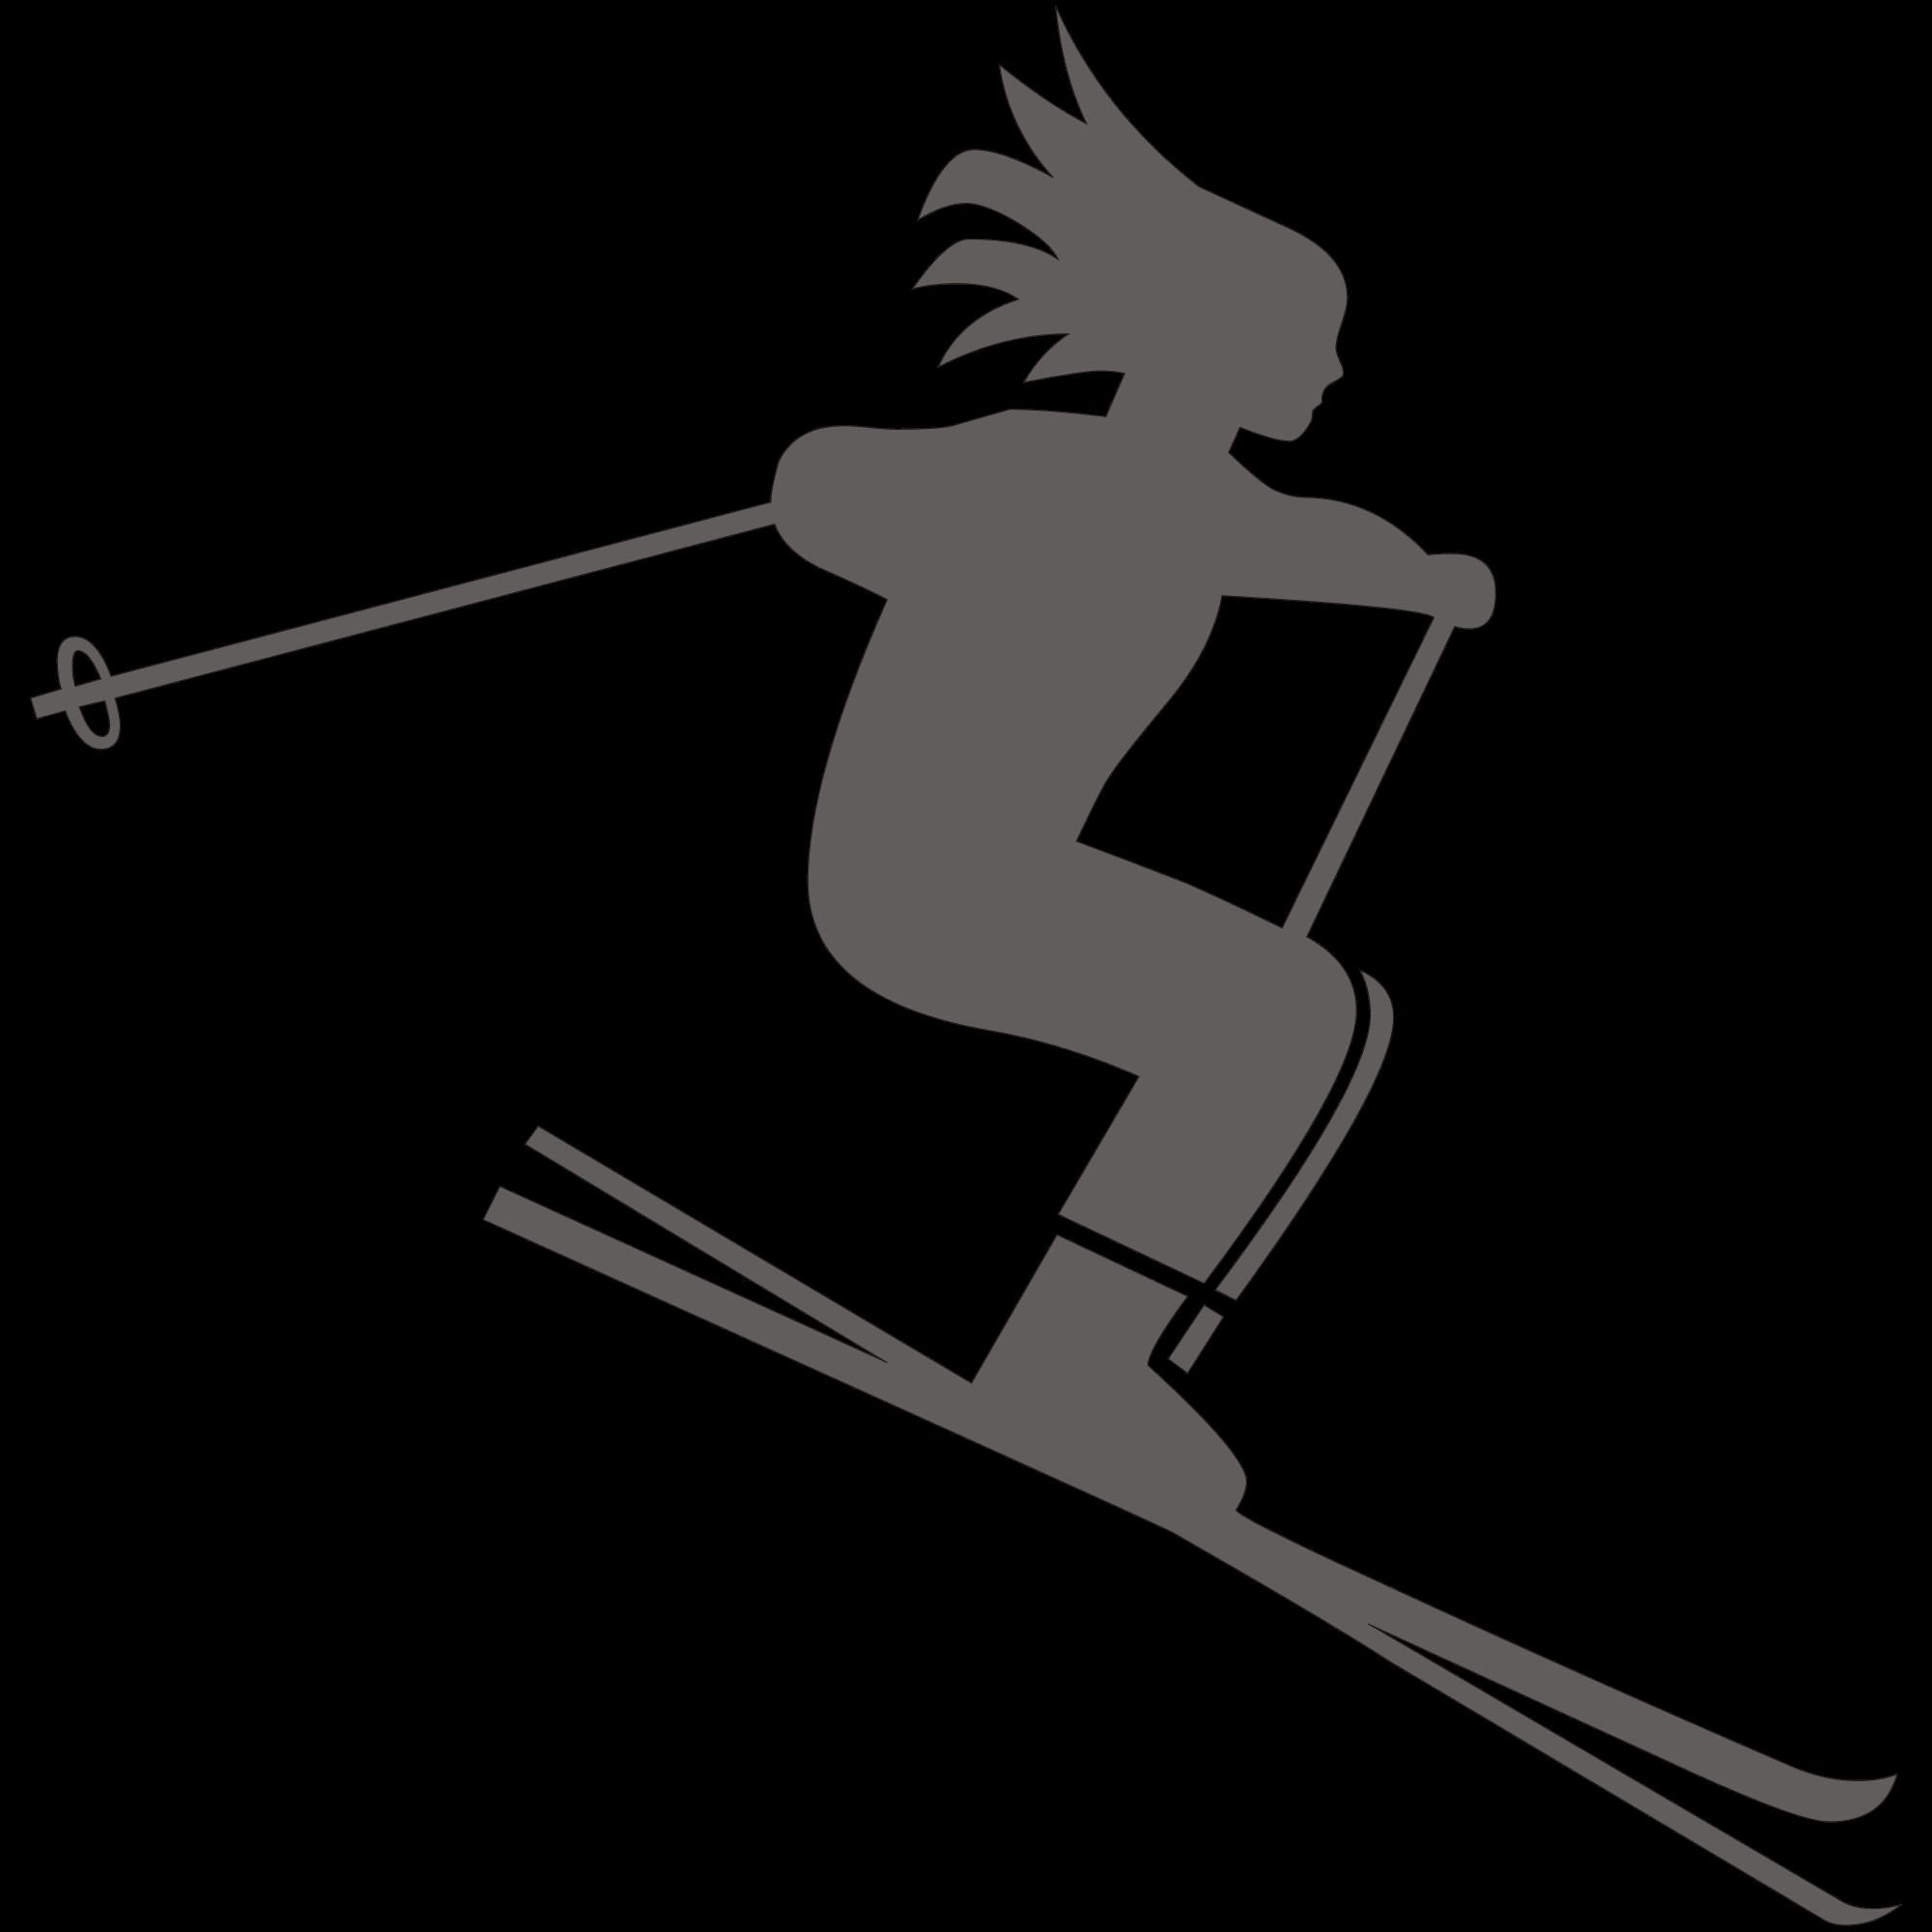 Skiing PNG image freeuse download